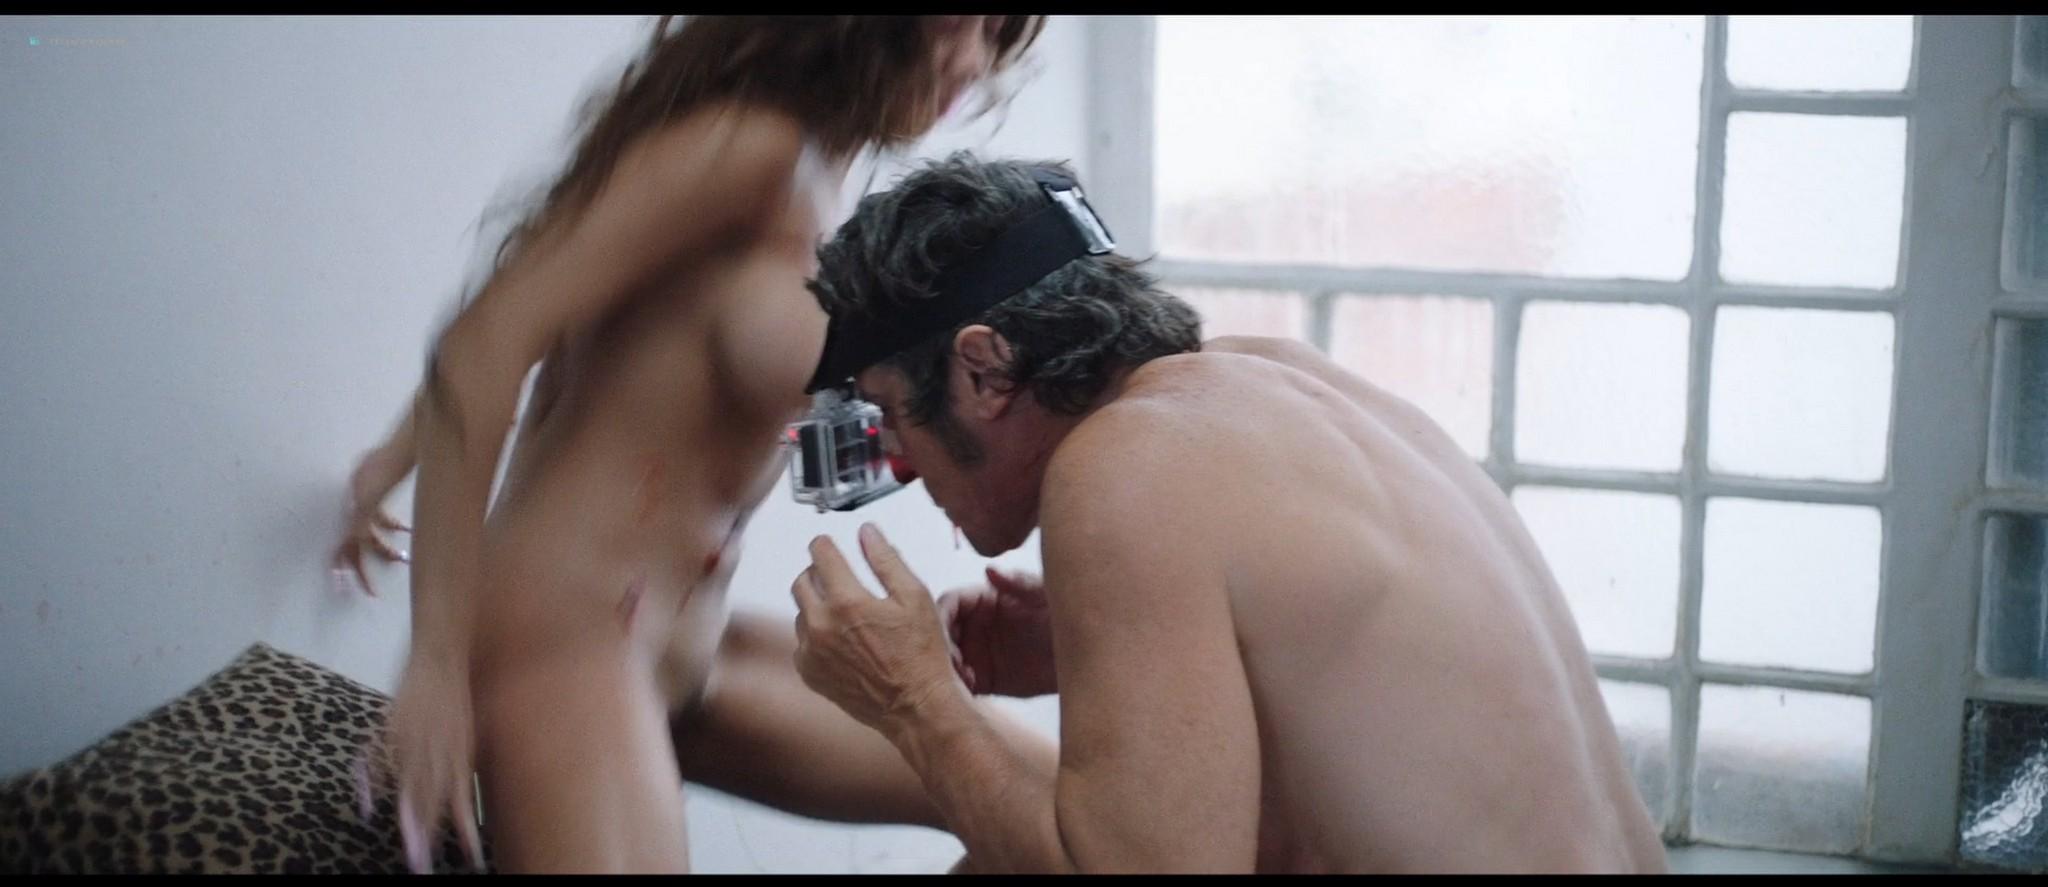 Julianne Nicholson nude sex Sabrina Alfonso nude too - Initials SG (AR-2019) HD 1080p Web (3)